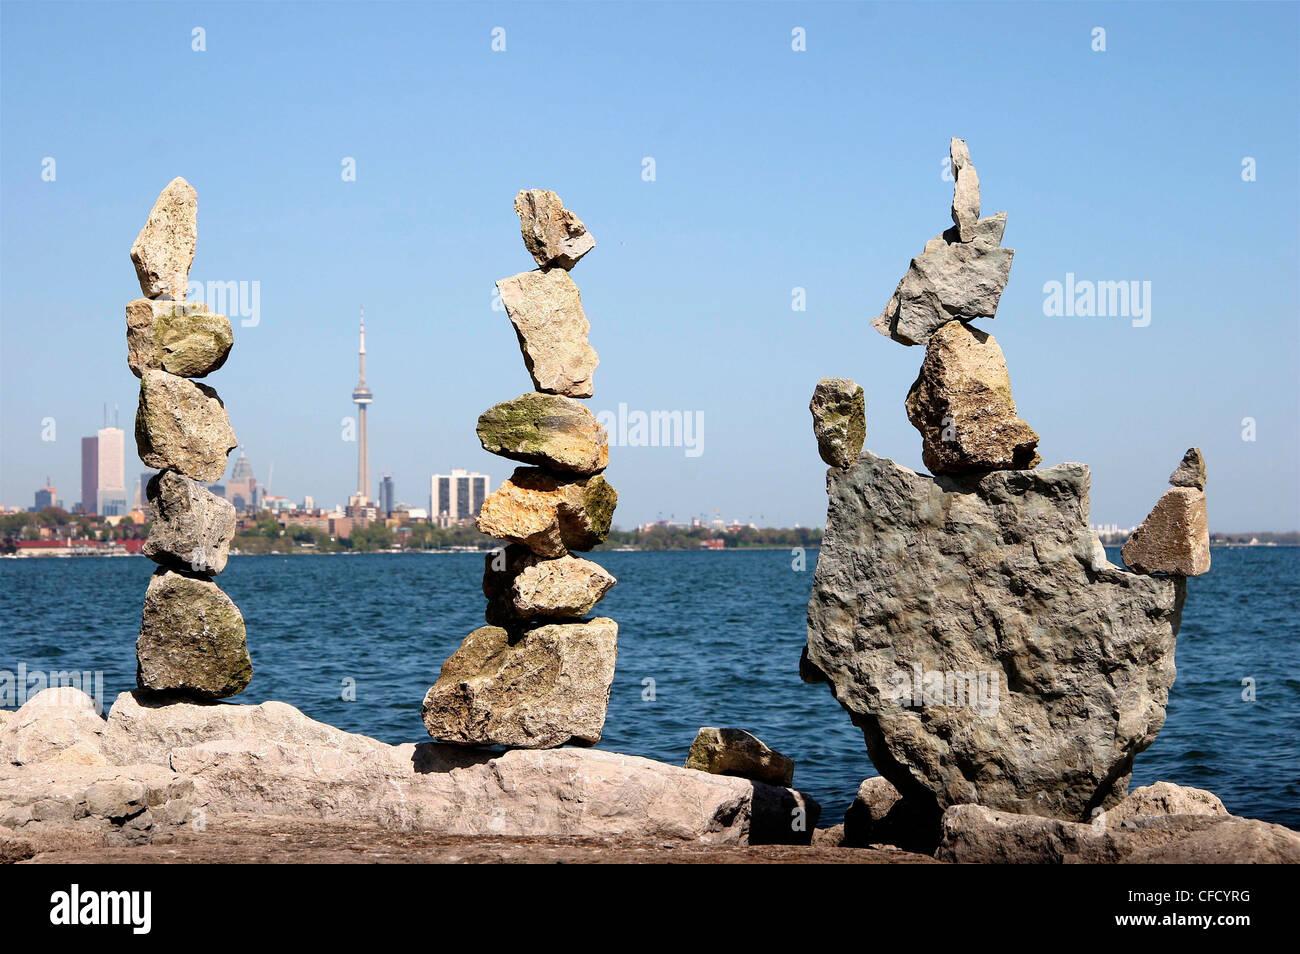 Rocas equilibradas, el Lago Ontario, Toronto, Ontario, Canadá Imagen De Stock